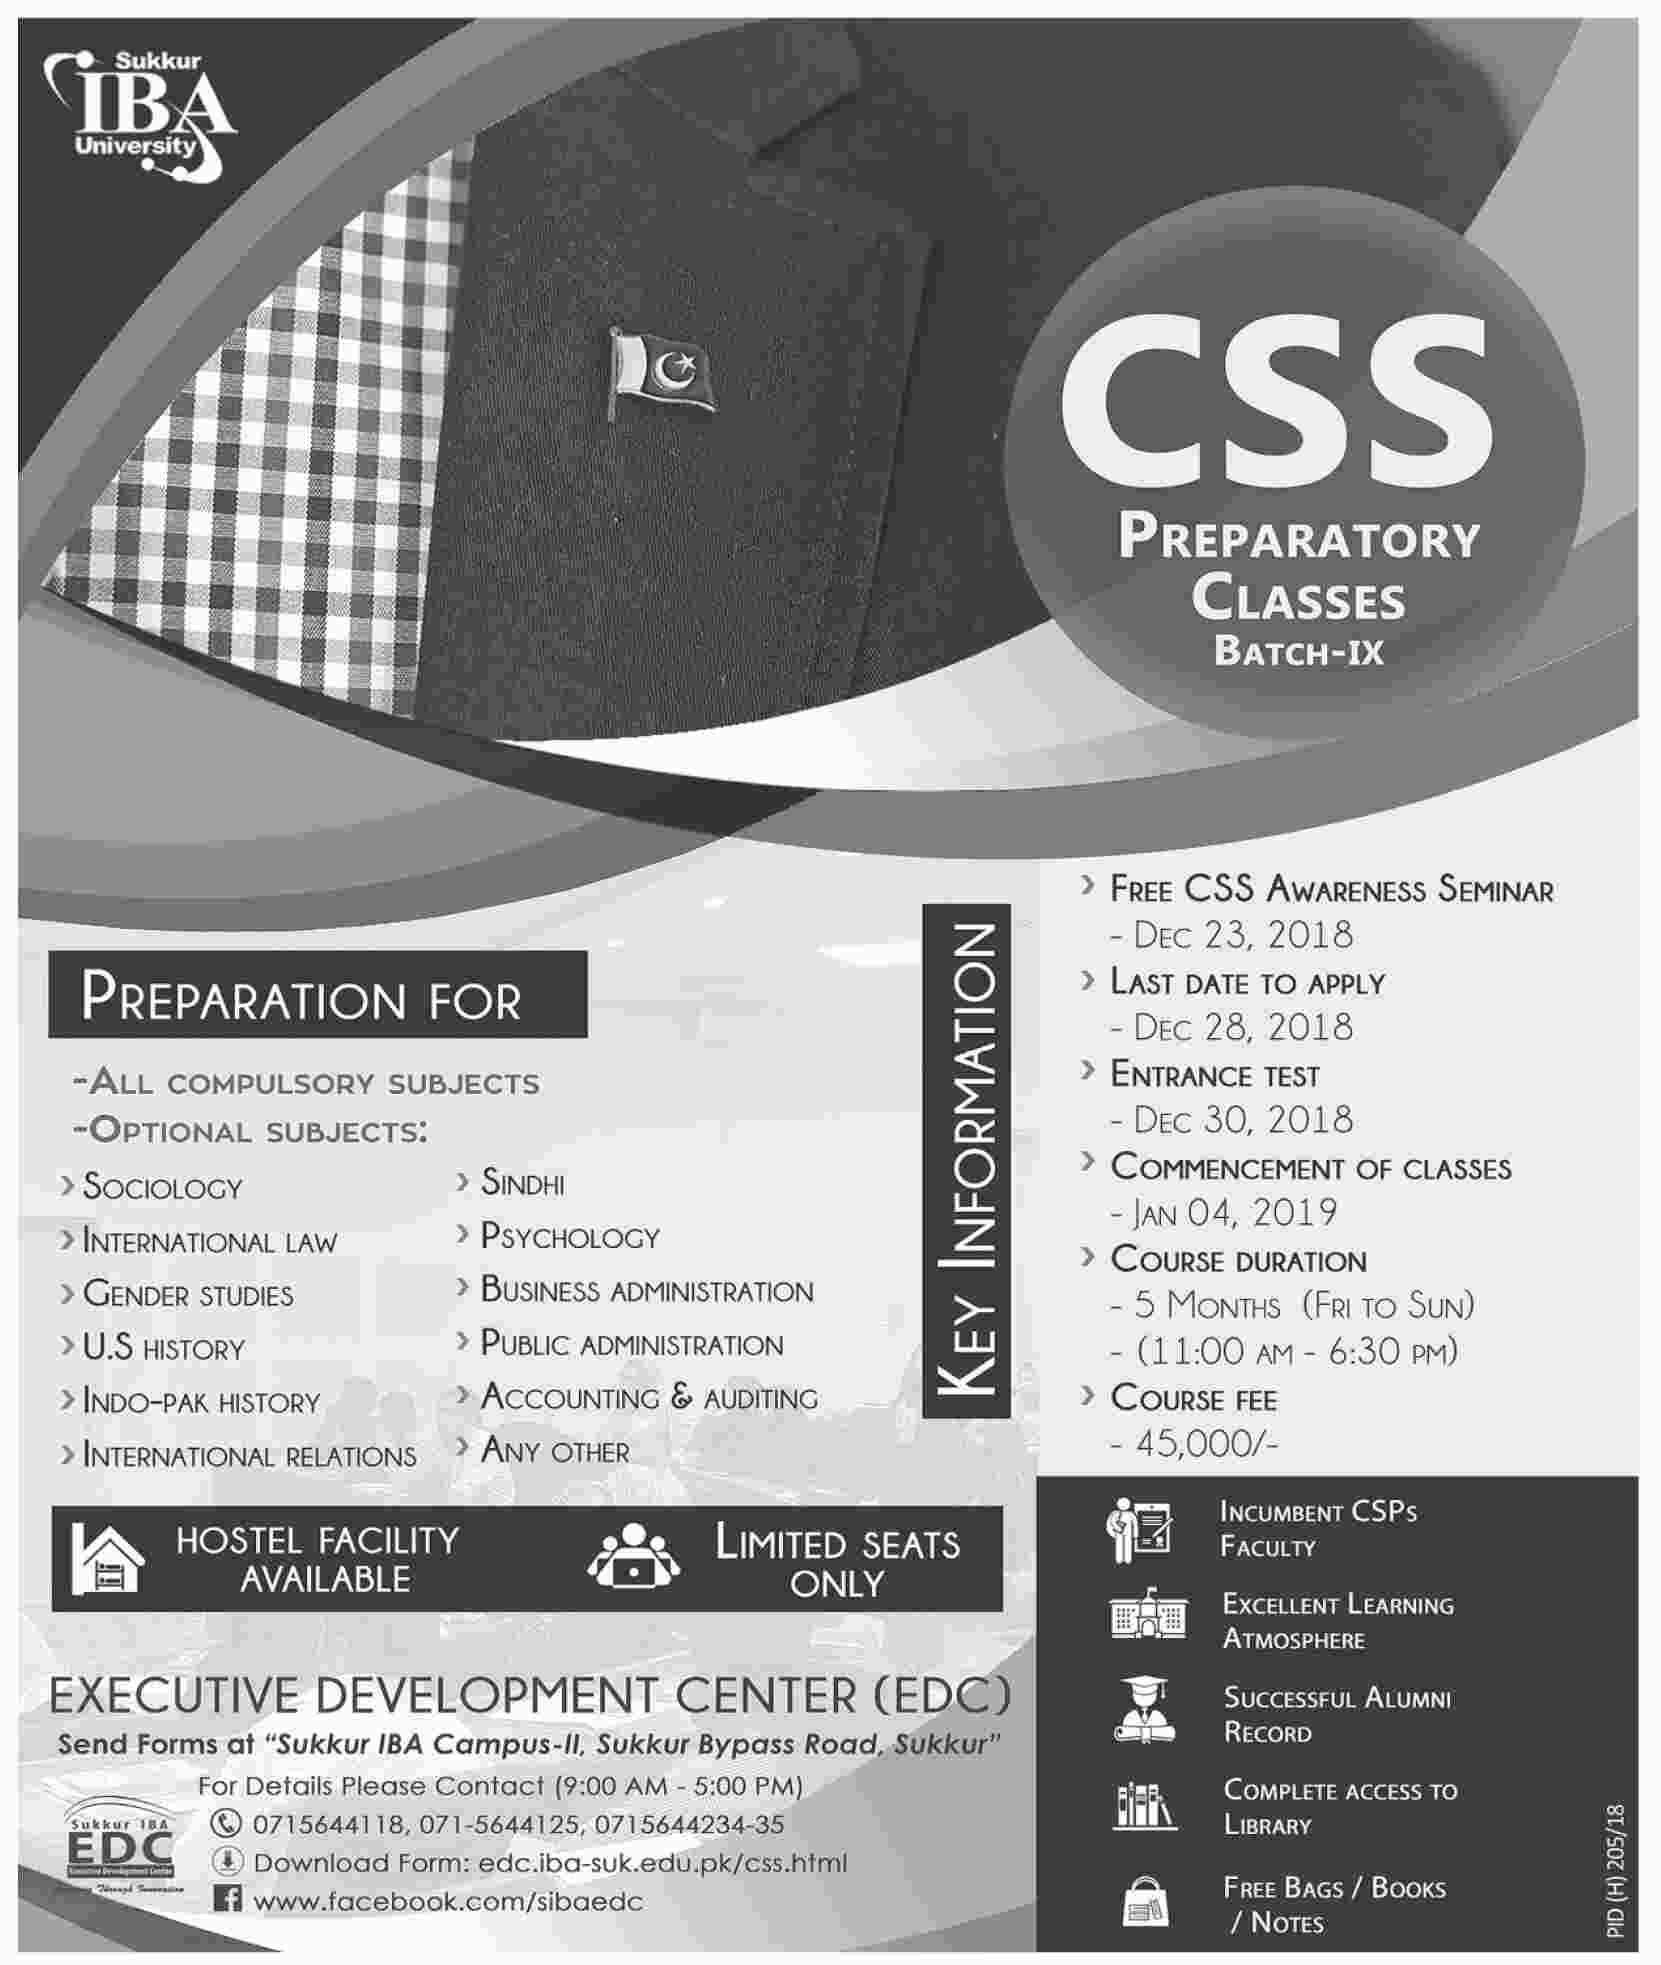 Free CSS Awareness Seminar and Preparatory Classes Batch (IX) - Sukkur IBA University